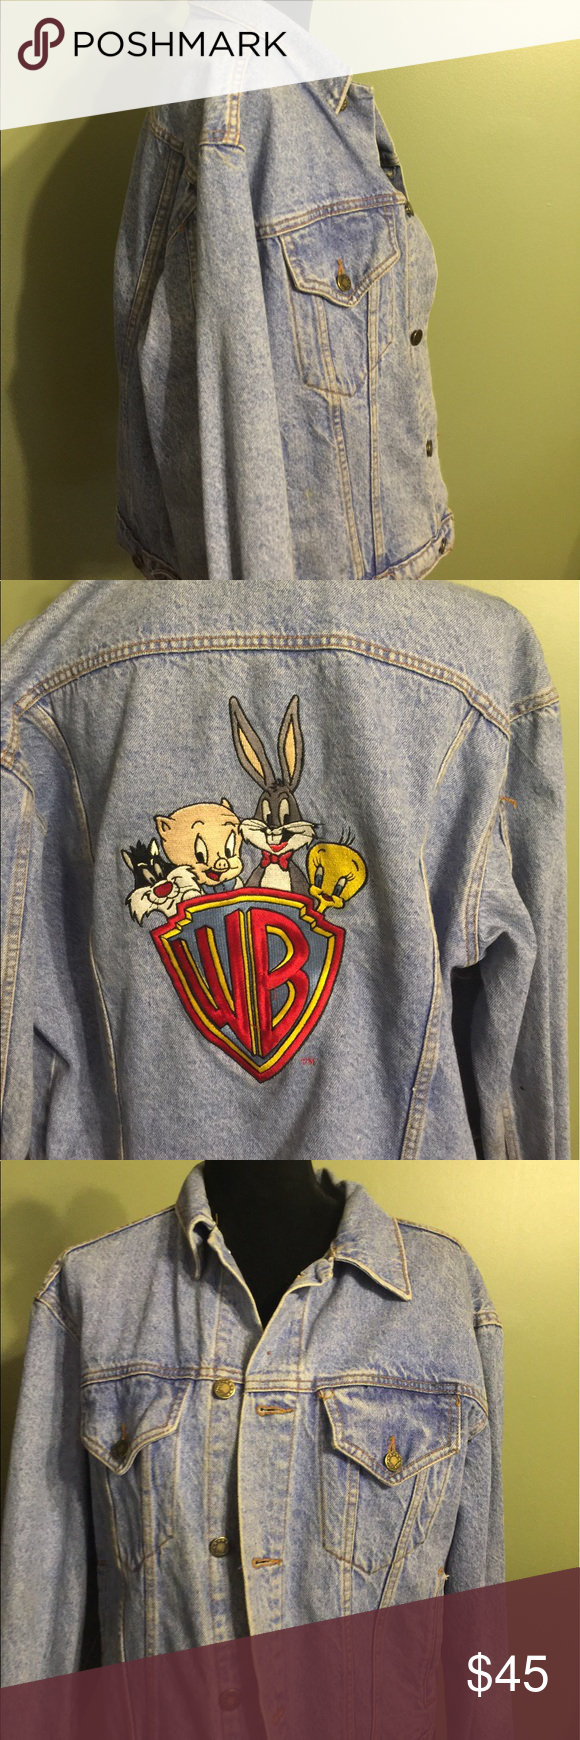 Warner Brother's Jean jacket medium Jean jacket bought at